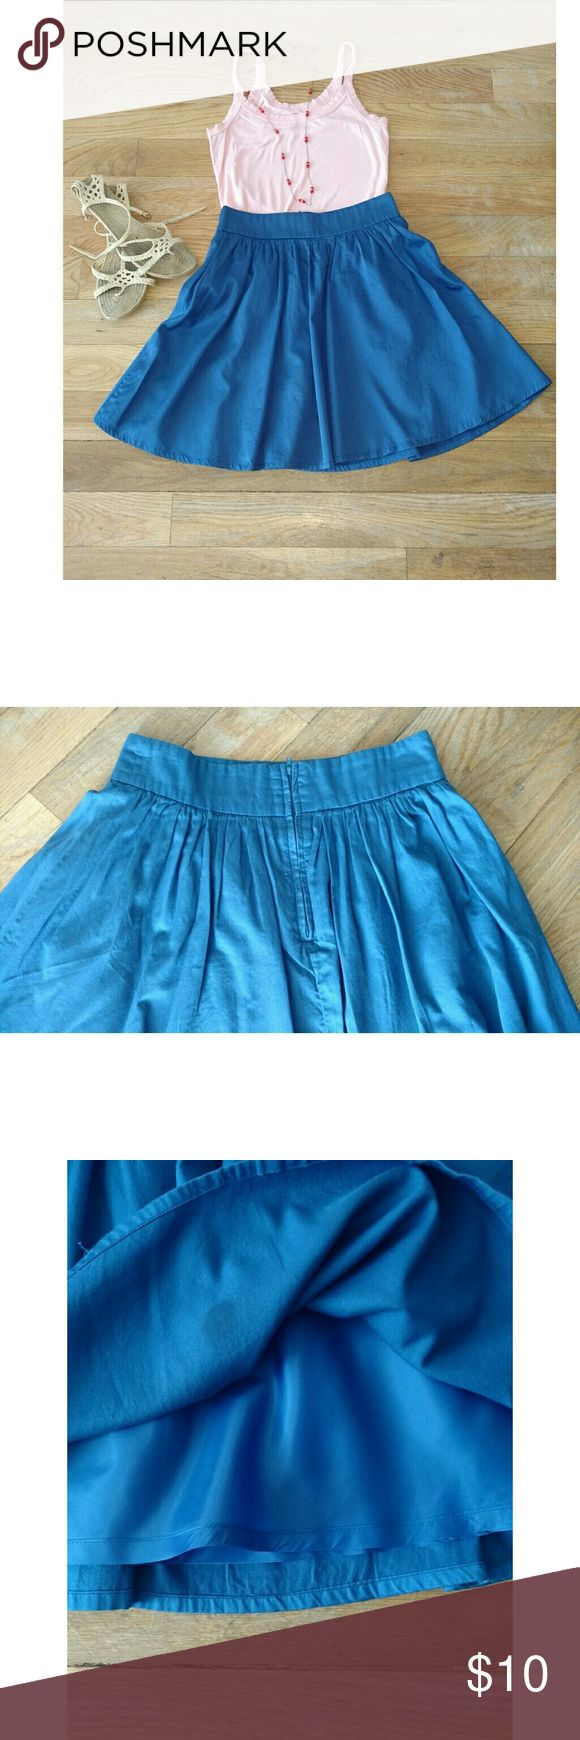 H&M blue skater skirt Blue skater skirt by Divided. So easy to dress up or down. The perfect date skirt. H&M Skirts Circle & Skater